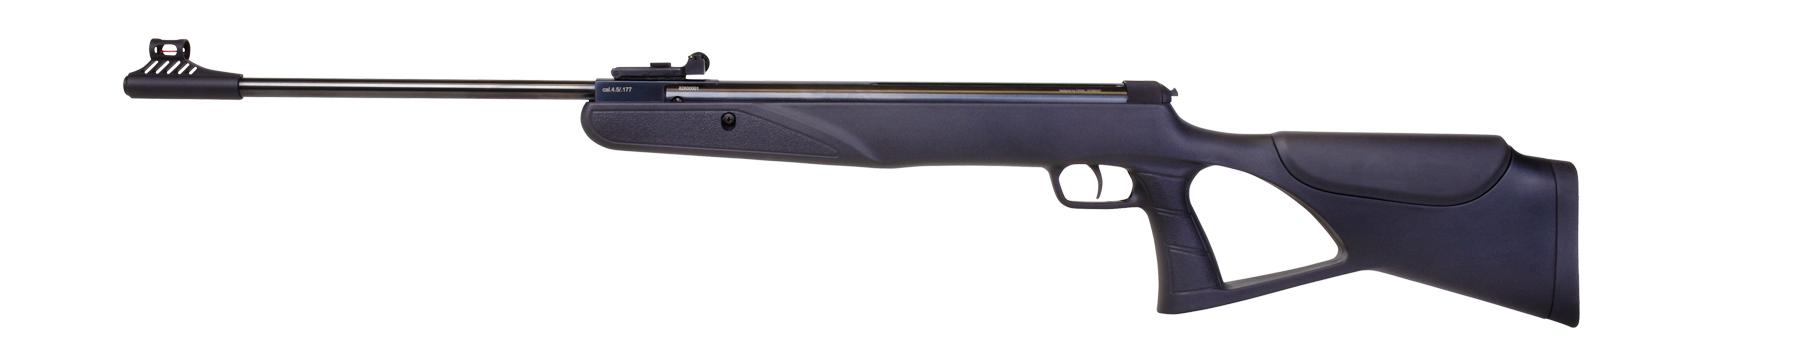 Diana Two-Sixty 4,5 mm ilmakivääri      285m/s